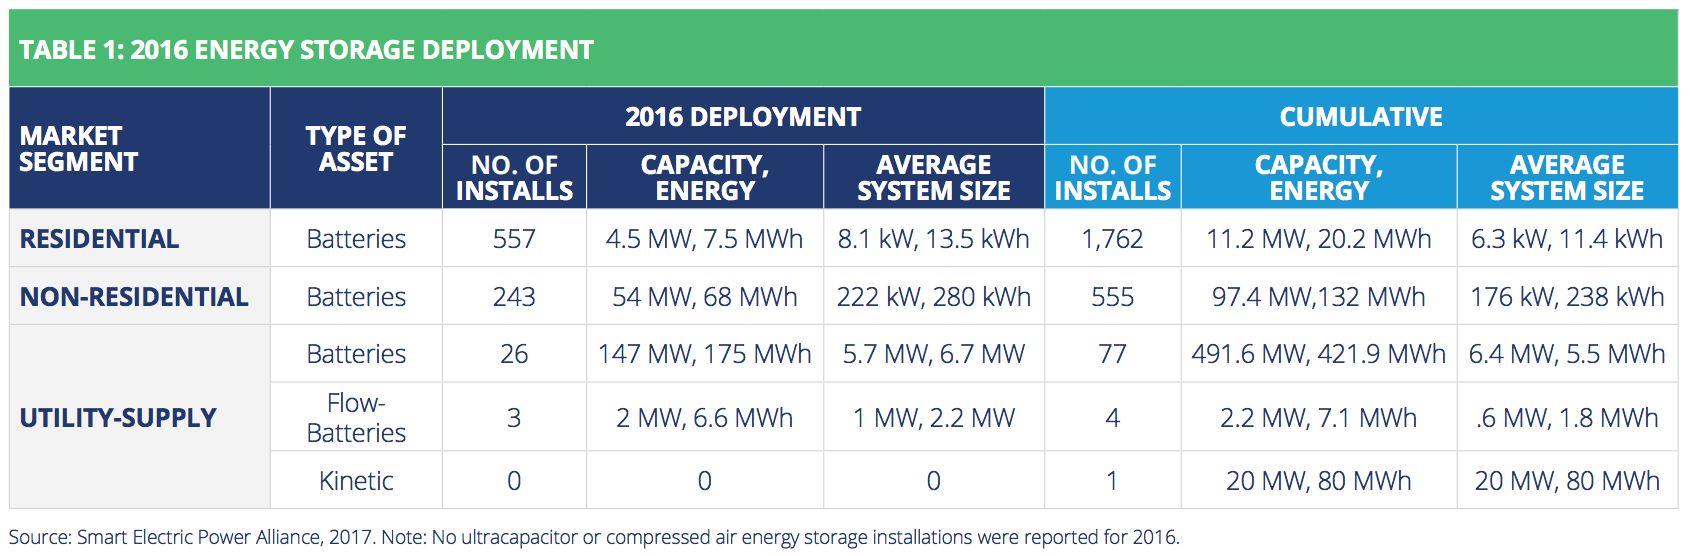 SEPA Survey: 31 Utilities Deployed Their First Energy